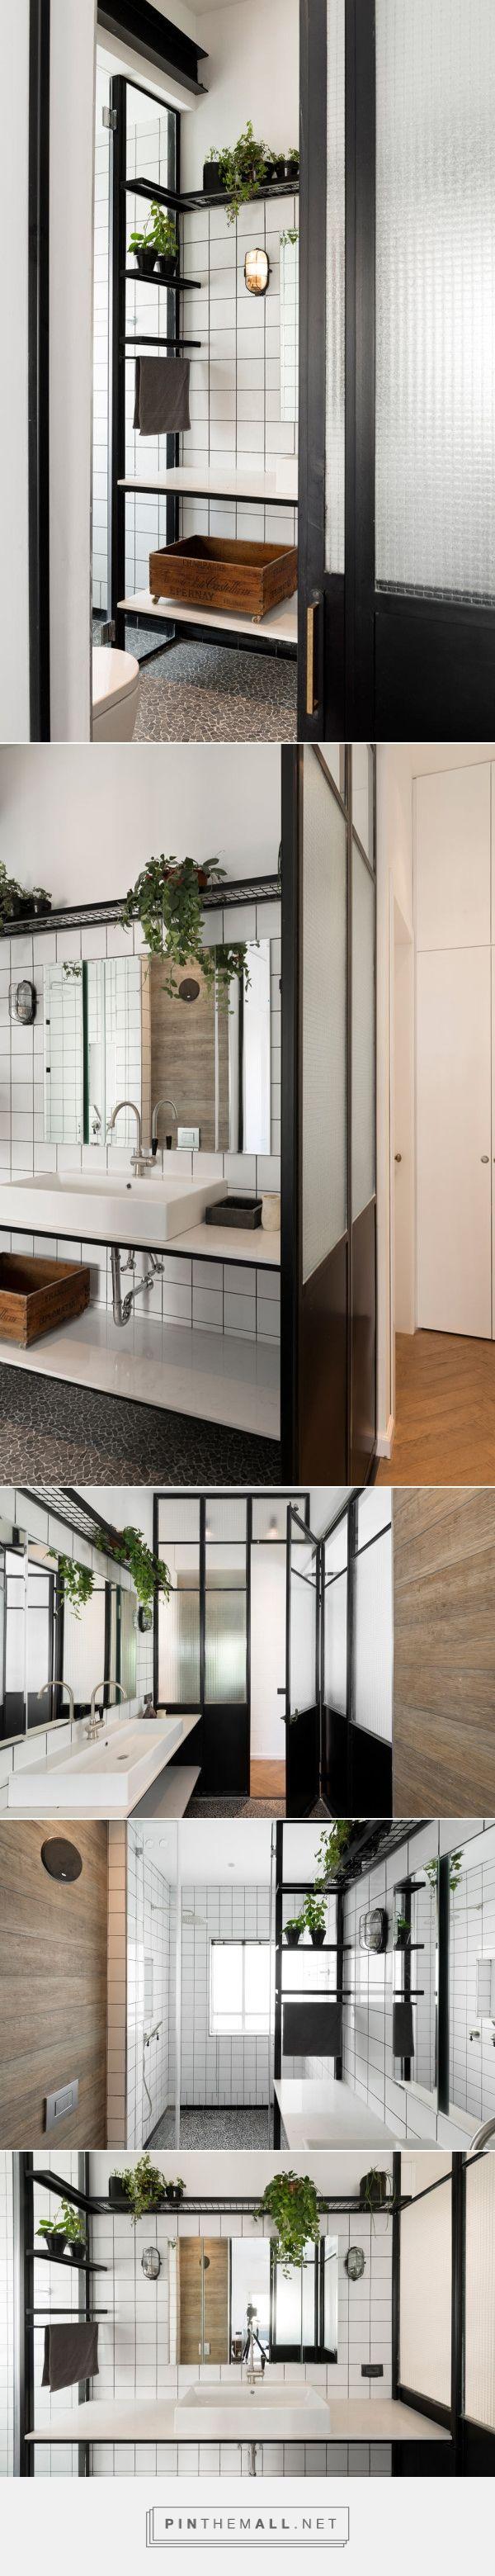 A Bauhaus Apartment in Tel Aviv Gets Renovated - Design Milk - created via http://pinthemall.net